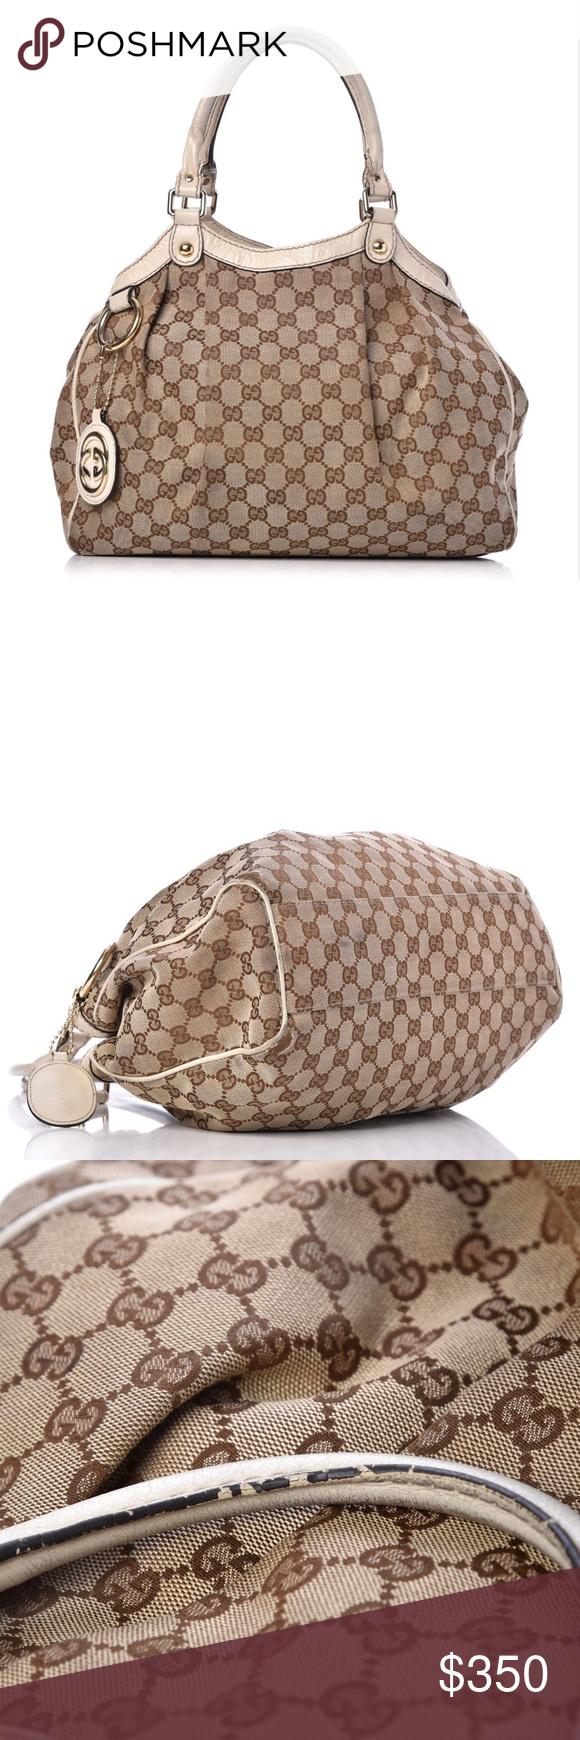 744aa8a8fec Gucci Monogram Guccissima Medium Sukey Tote Bag Gucci Guccissima Medium  Sukey Tote Bag. Good used